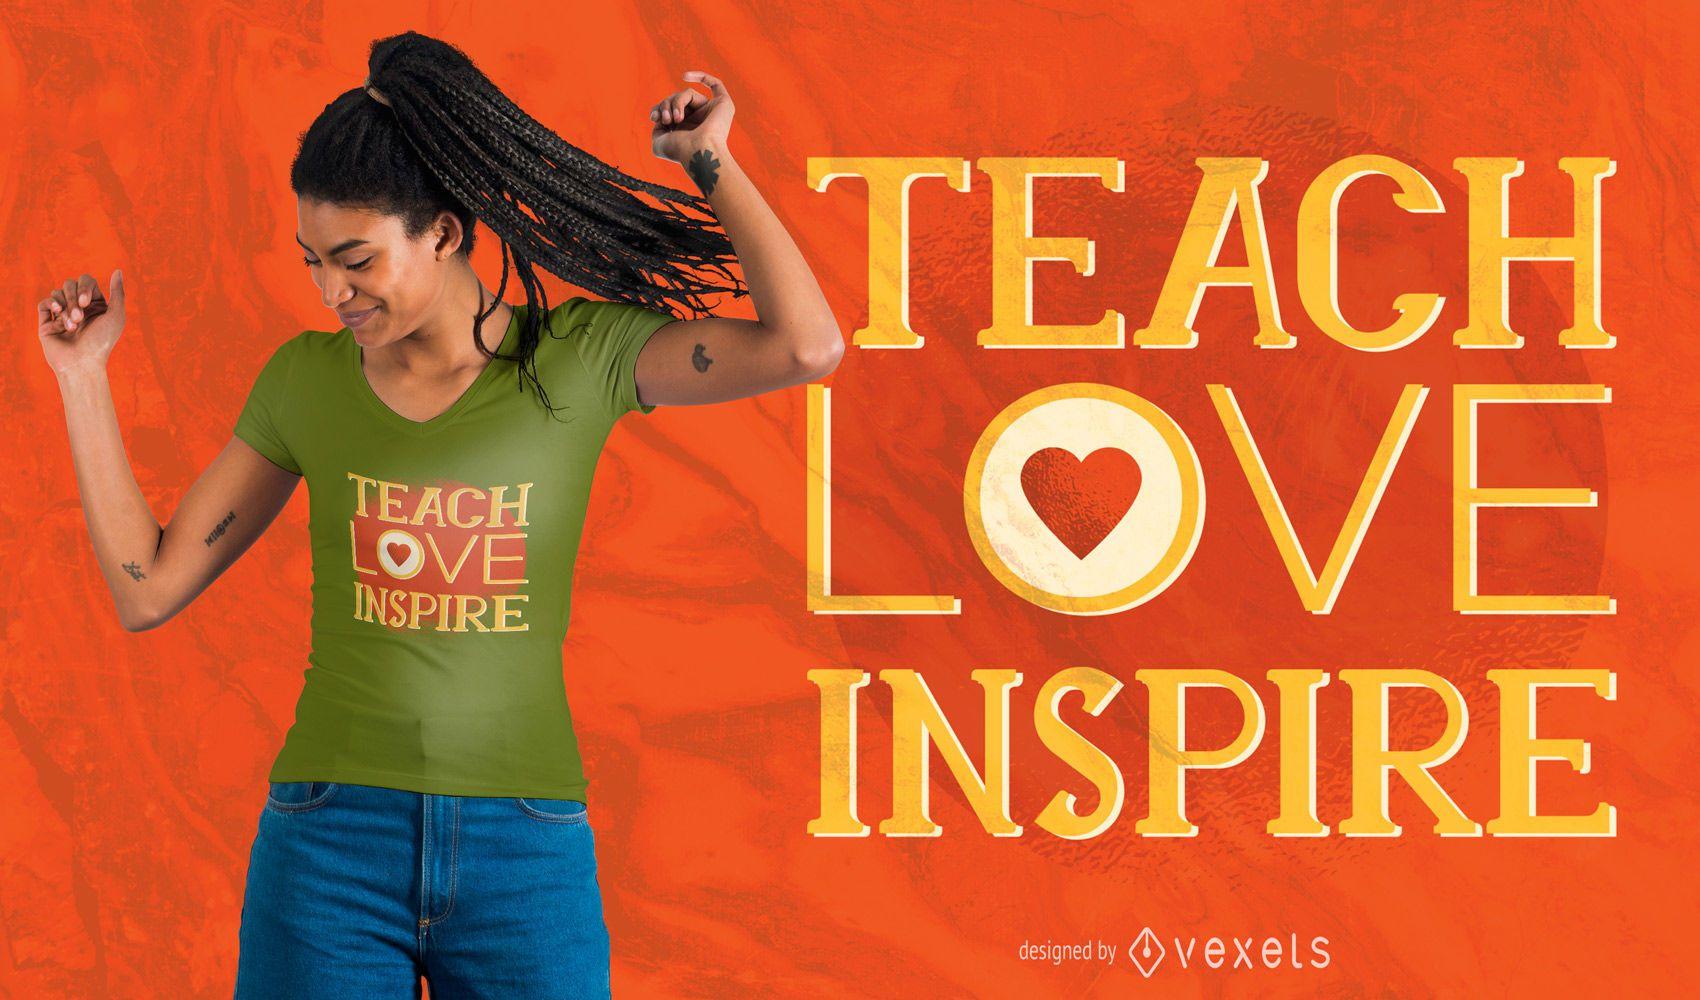 teacher quote t-shirt design